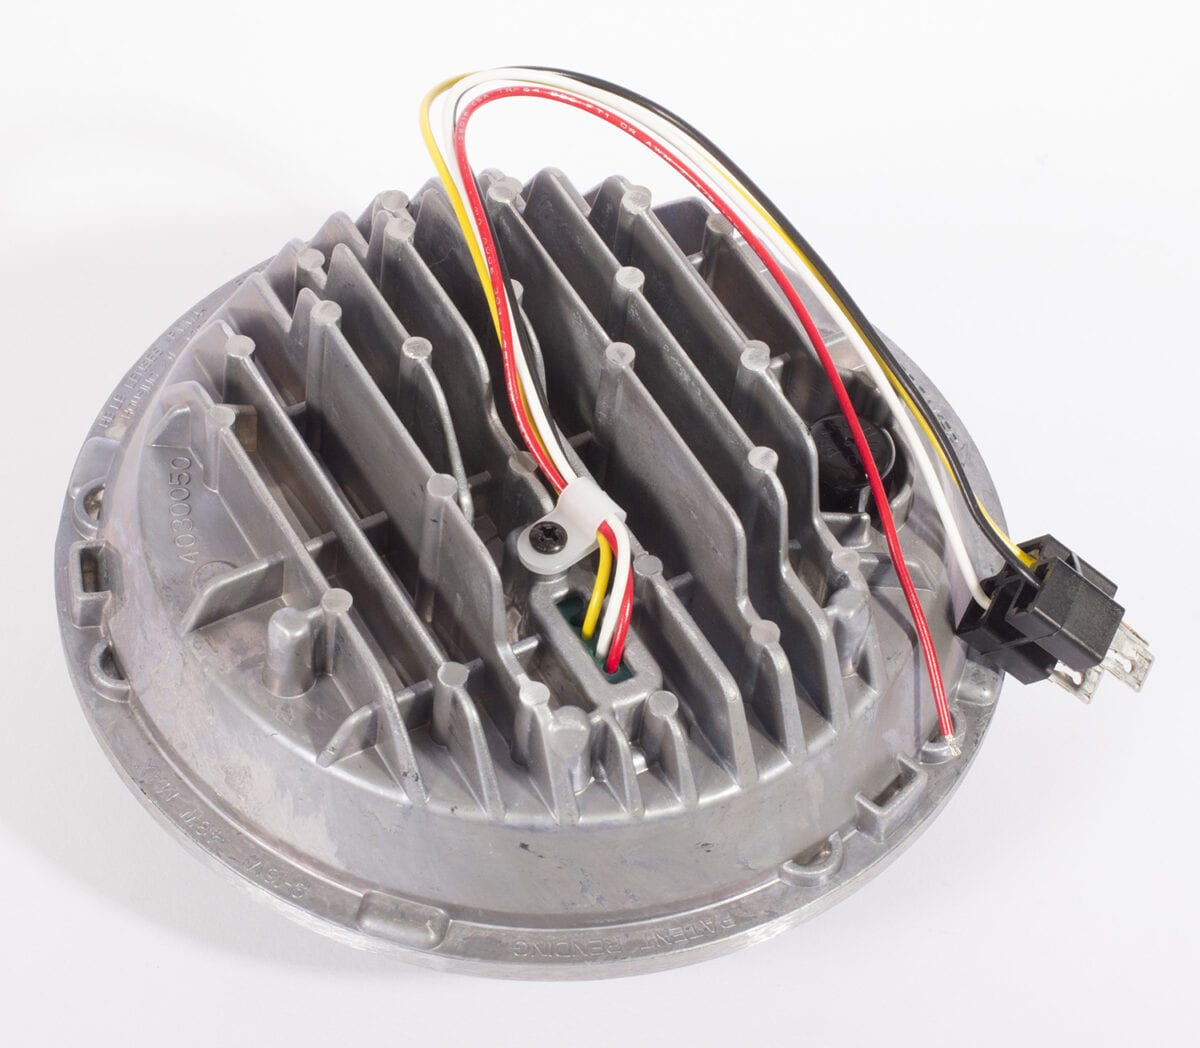 JW Speaker cornering light 2